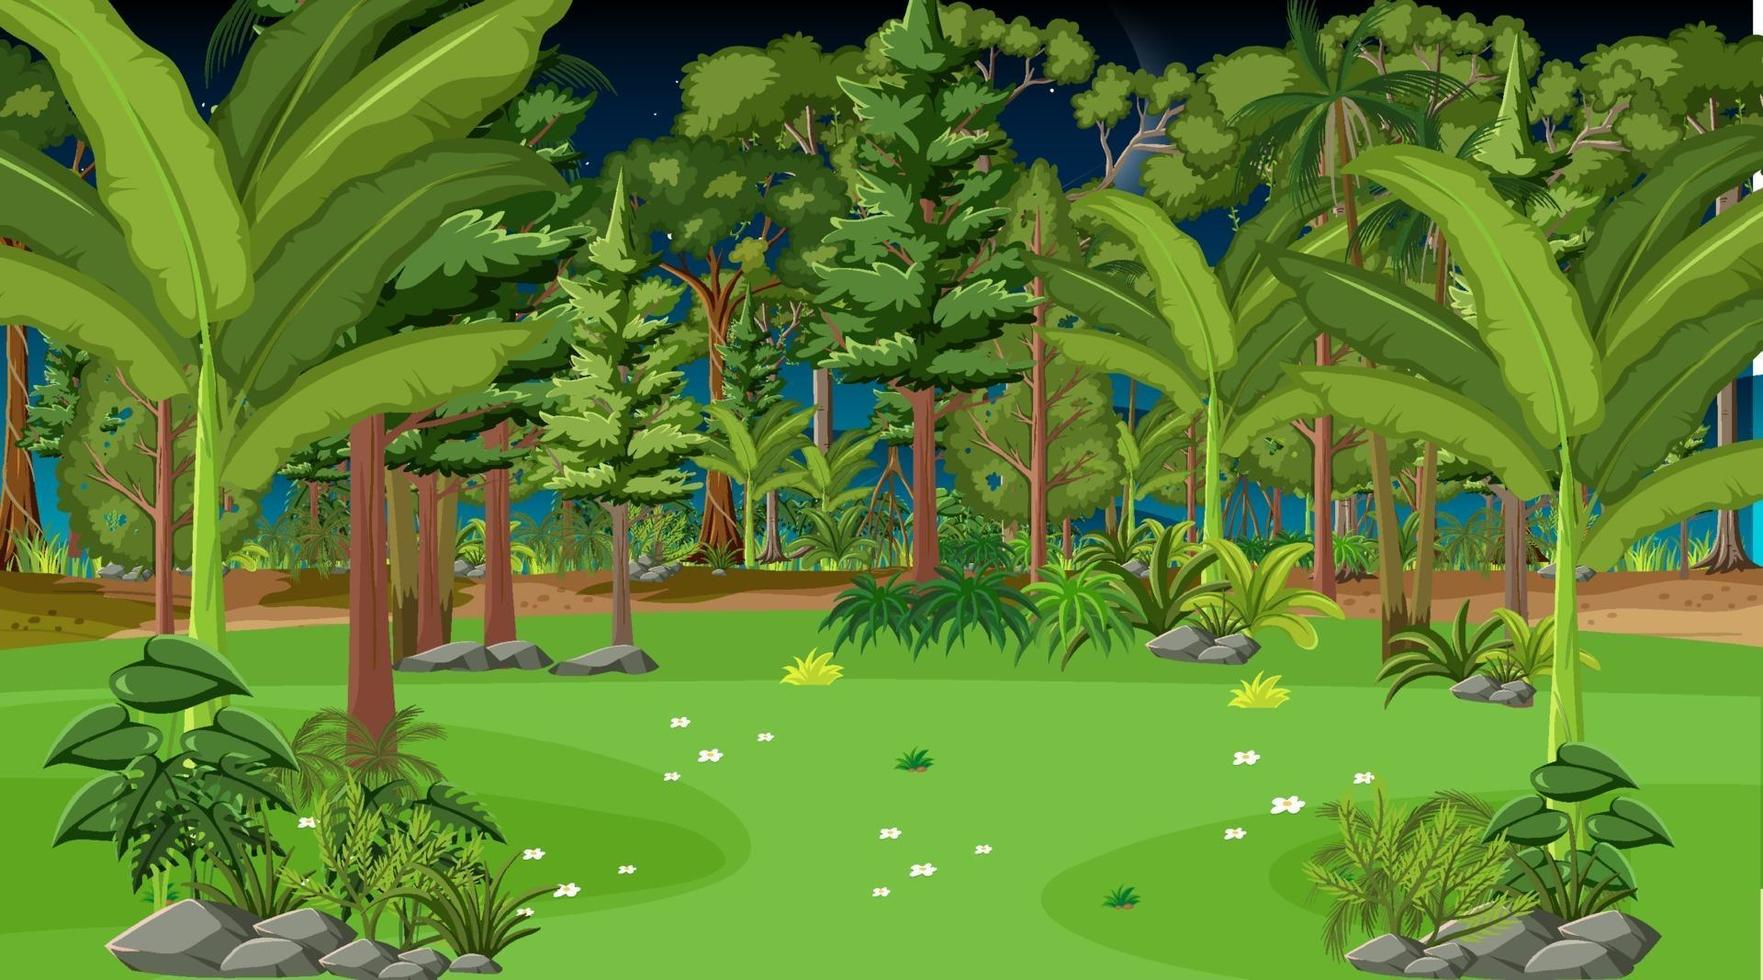 skog landskap scen på natten vektor